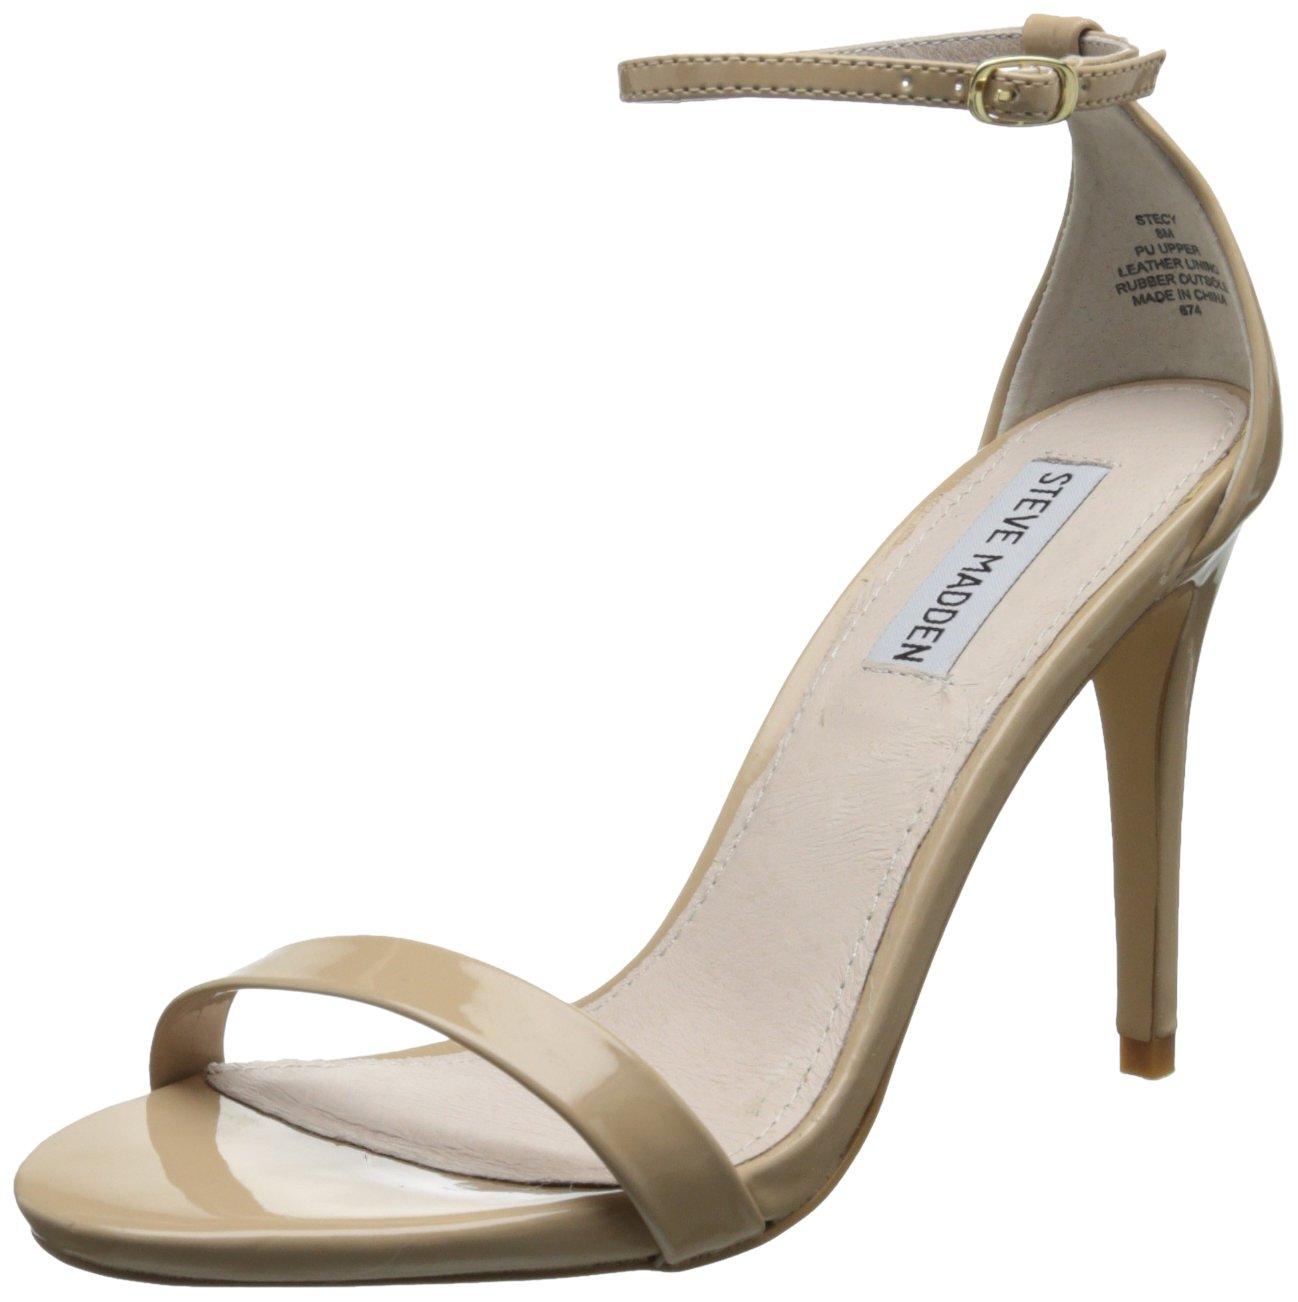 Steve Madden Women's Stecy Dress Sandal,Blush Patent,7 M US